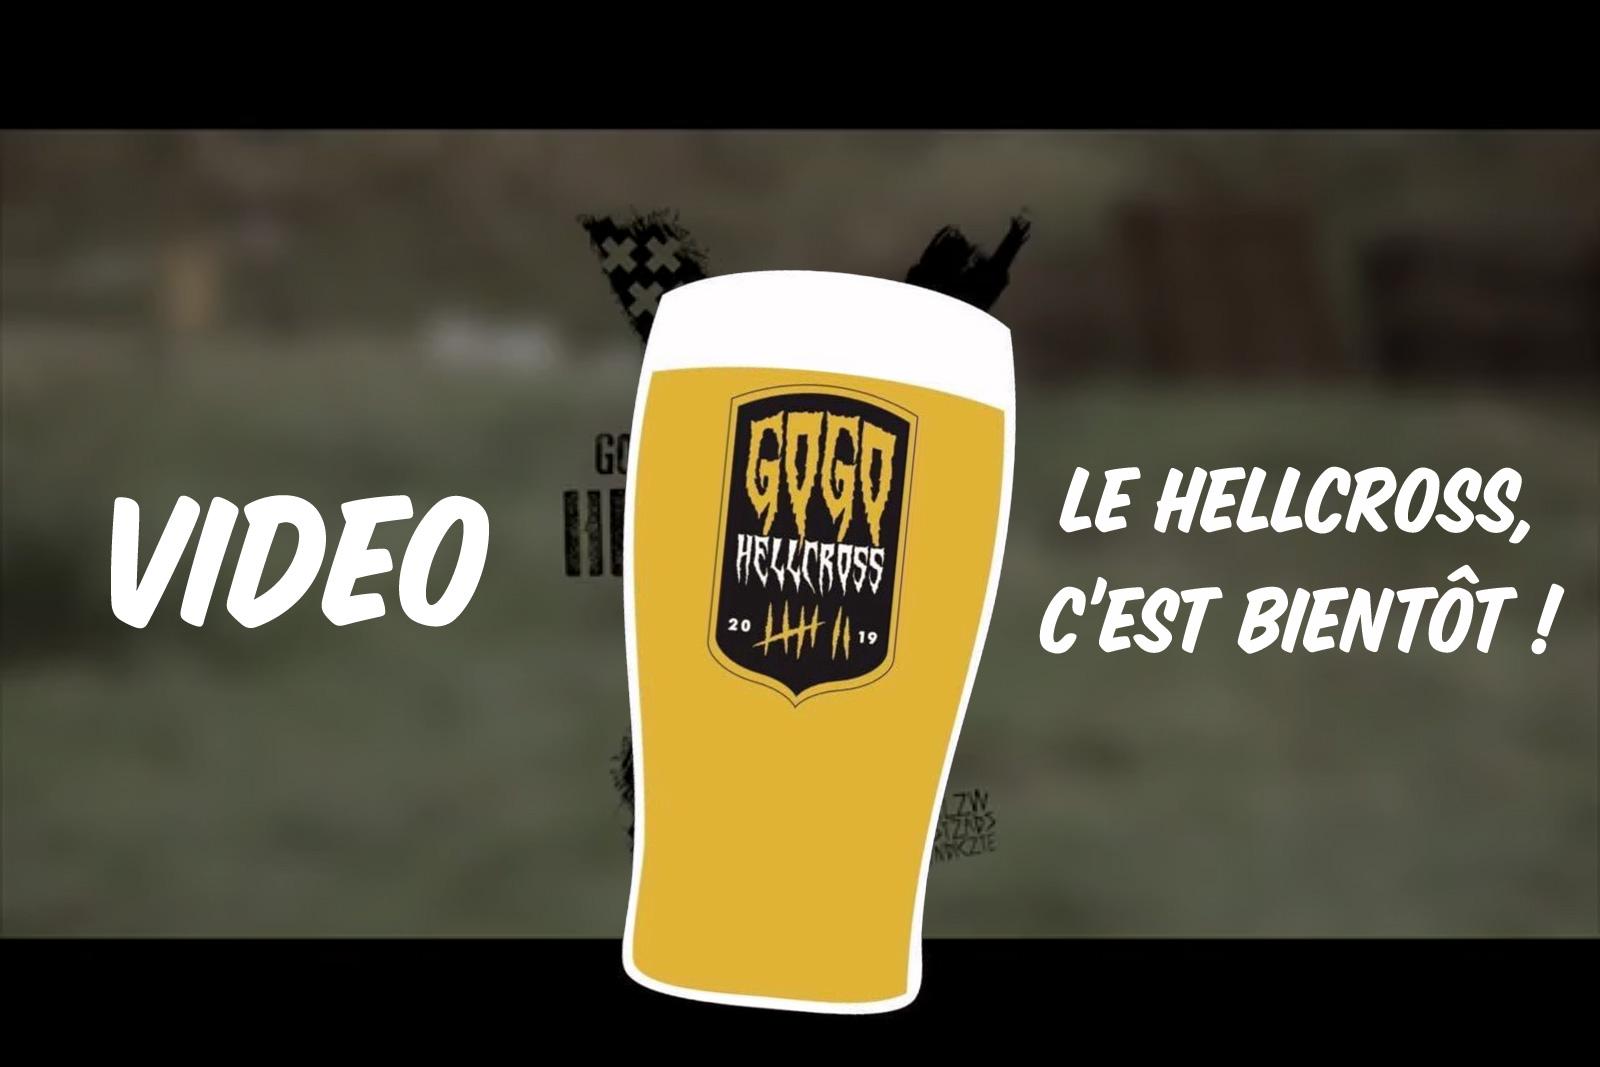 Hellcross 2019